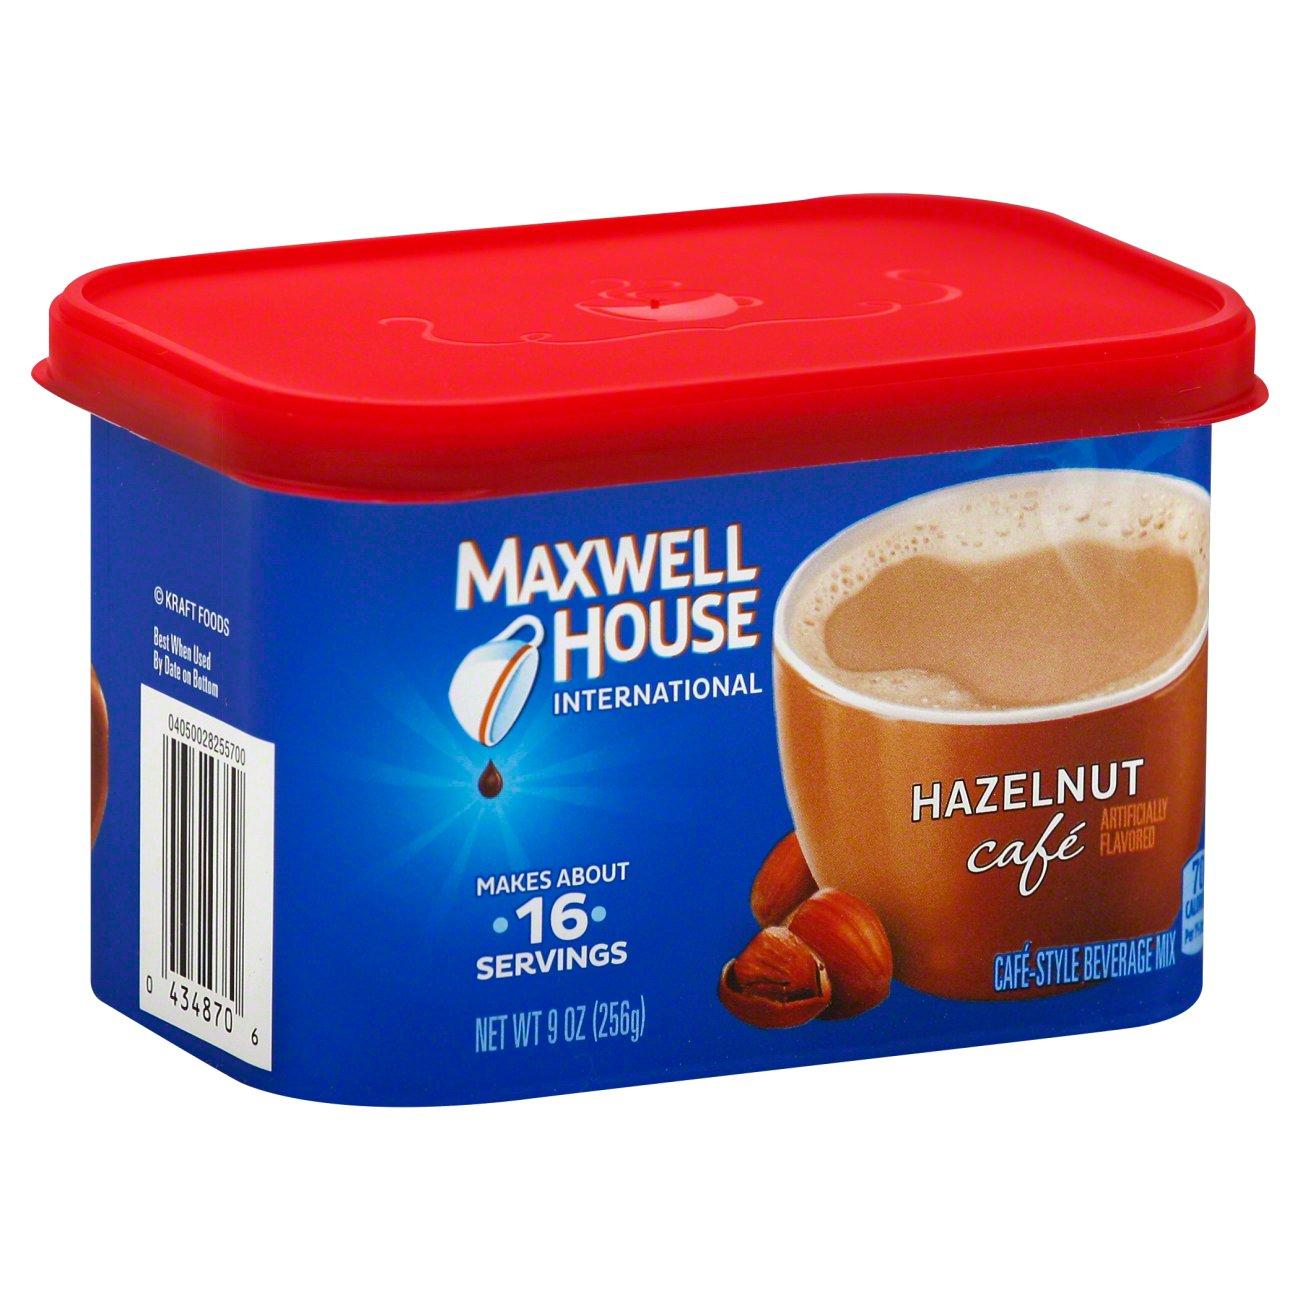 Maxwell House International Cafe